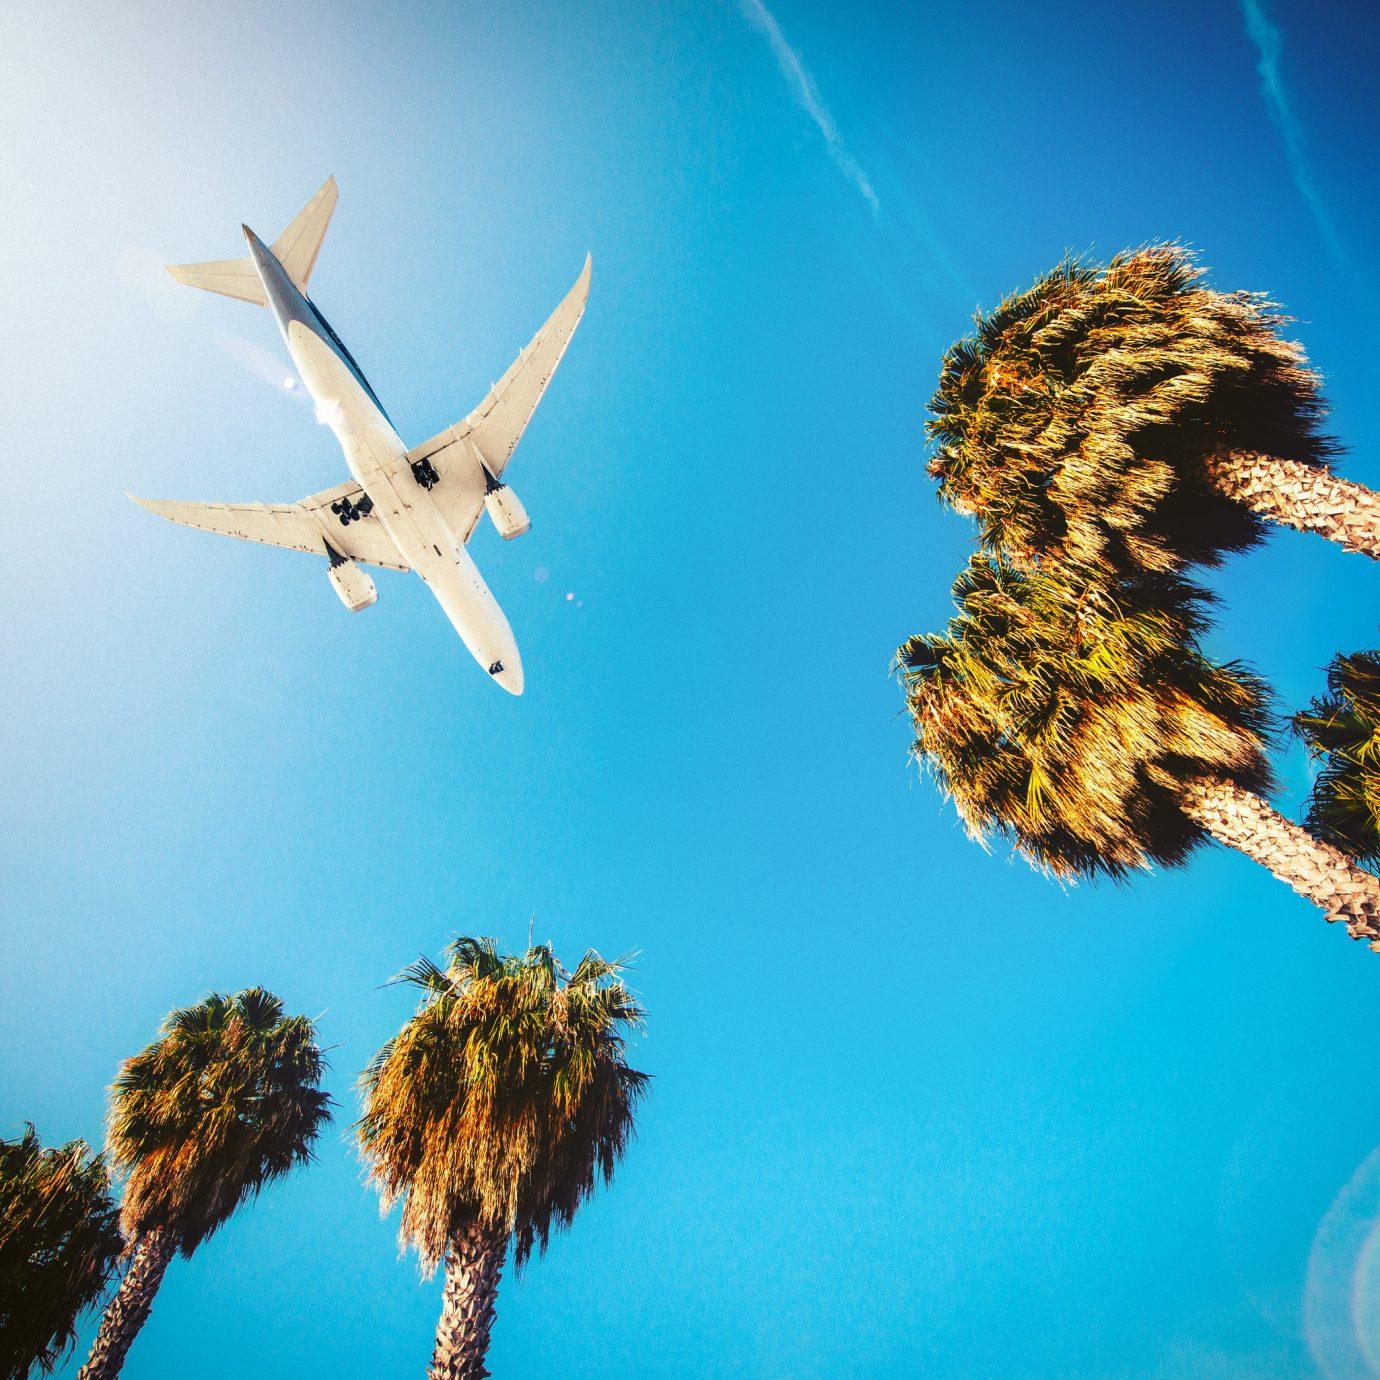 A plane flying through a bright blue sky